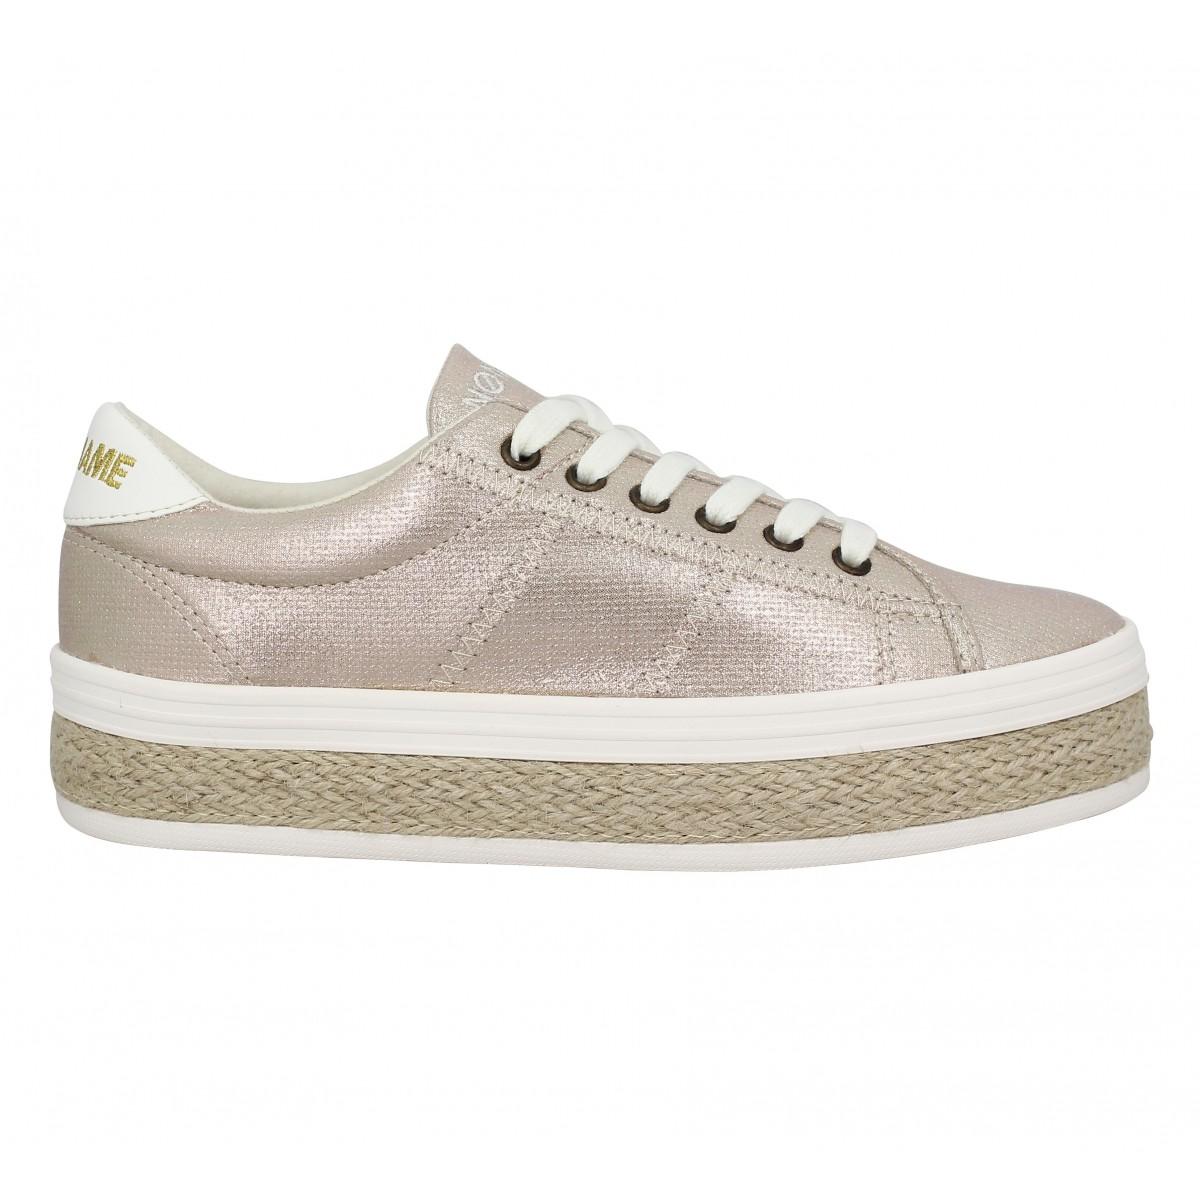 No Name Chaussures MALIBU GLOW No Name soldes 0RyBnFM1